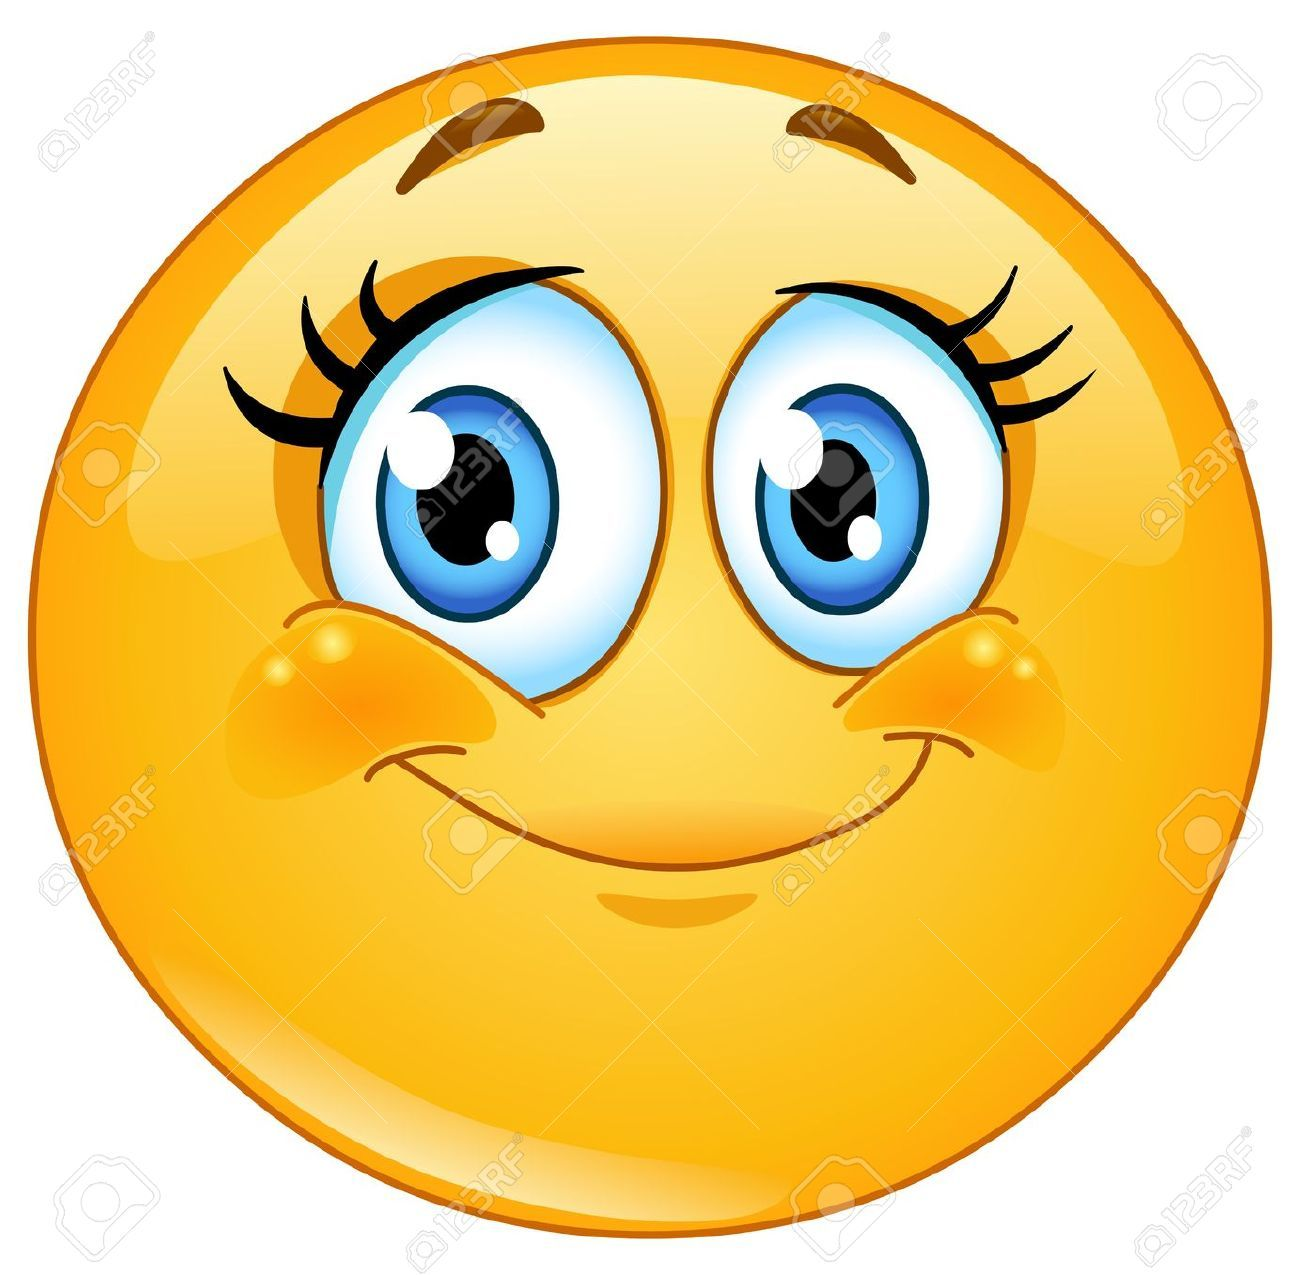 19320250 cute eyelashes emoticon stock vector smiley face emoticon rh pinterest co uk Laughing Smiley Face Clip Art Crazy Smiley Face Clip Art